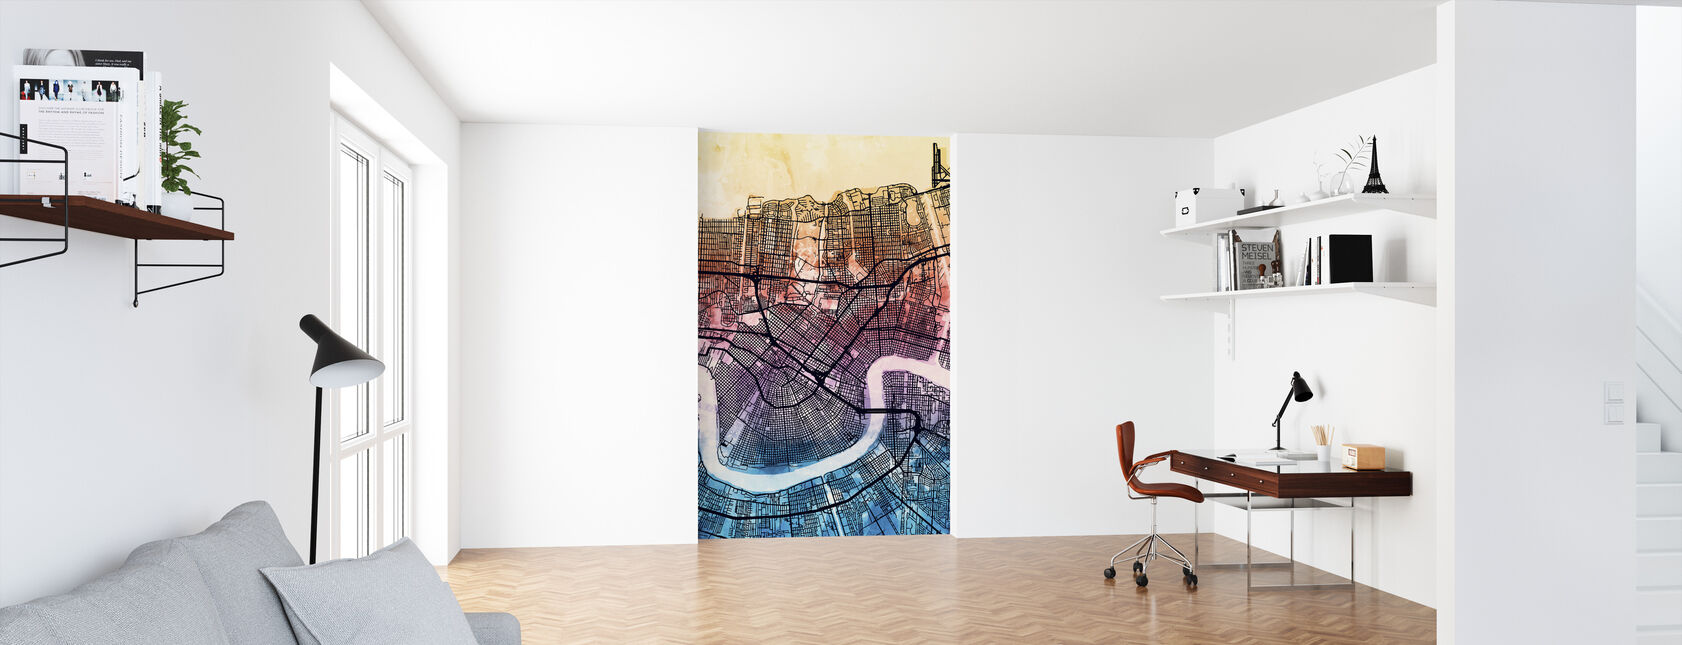 New Orleans Street Map - Wallpaper - Office